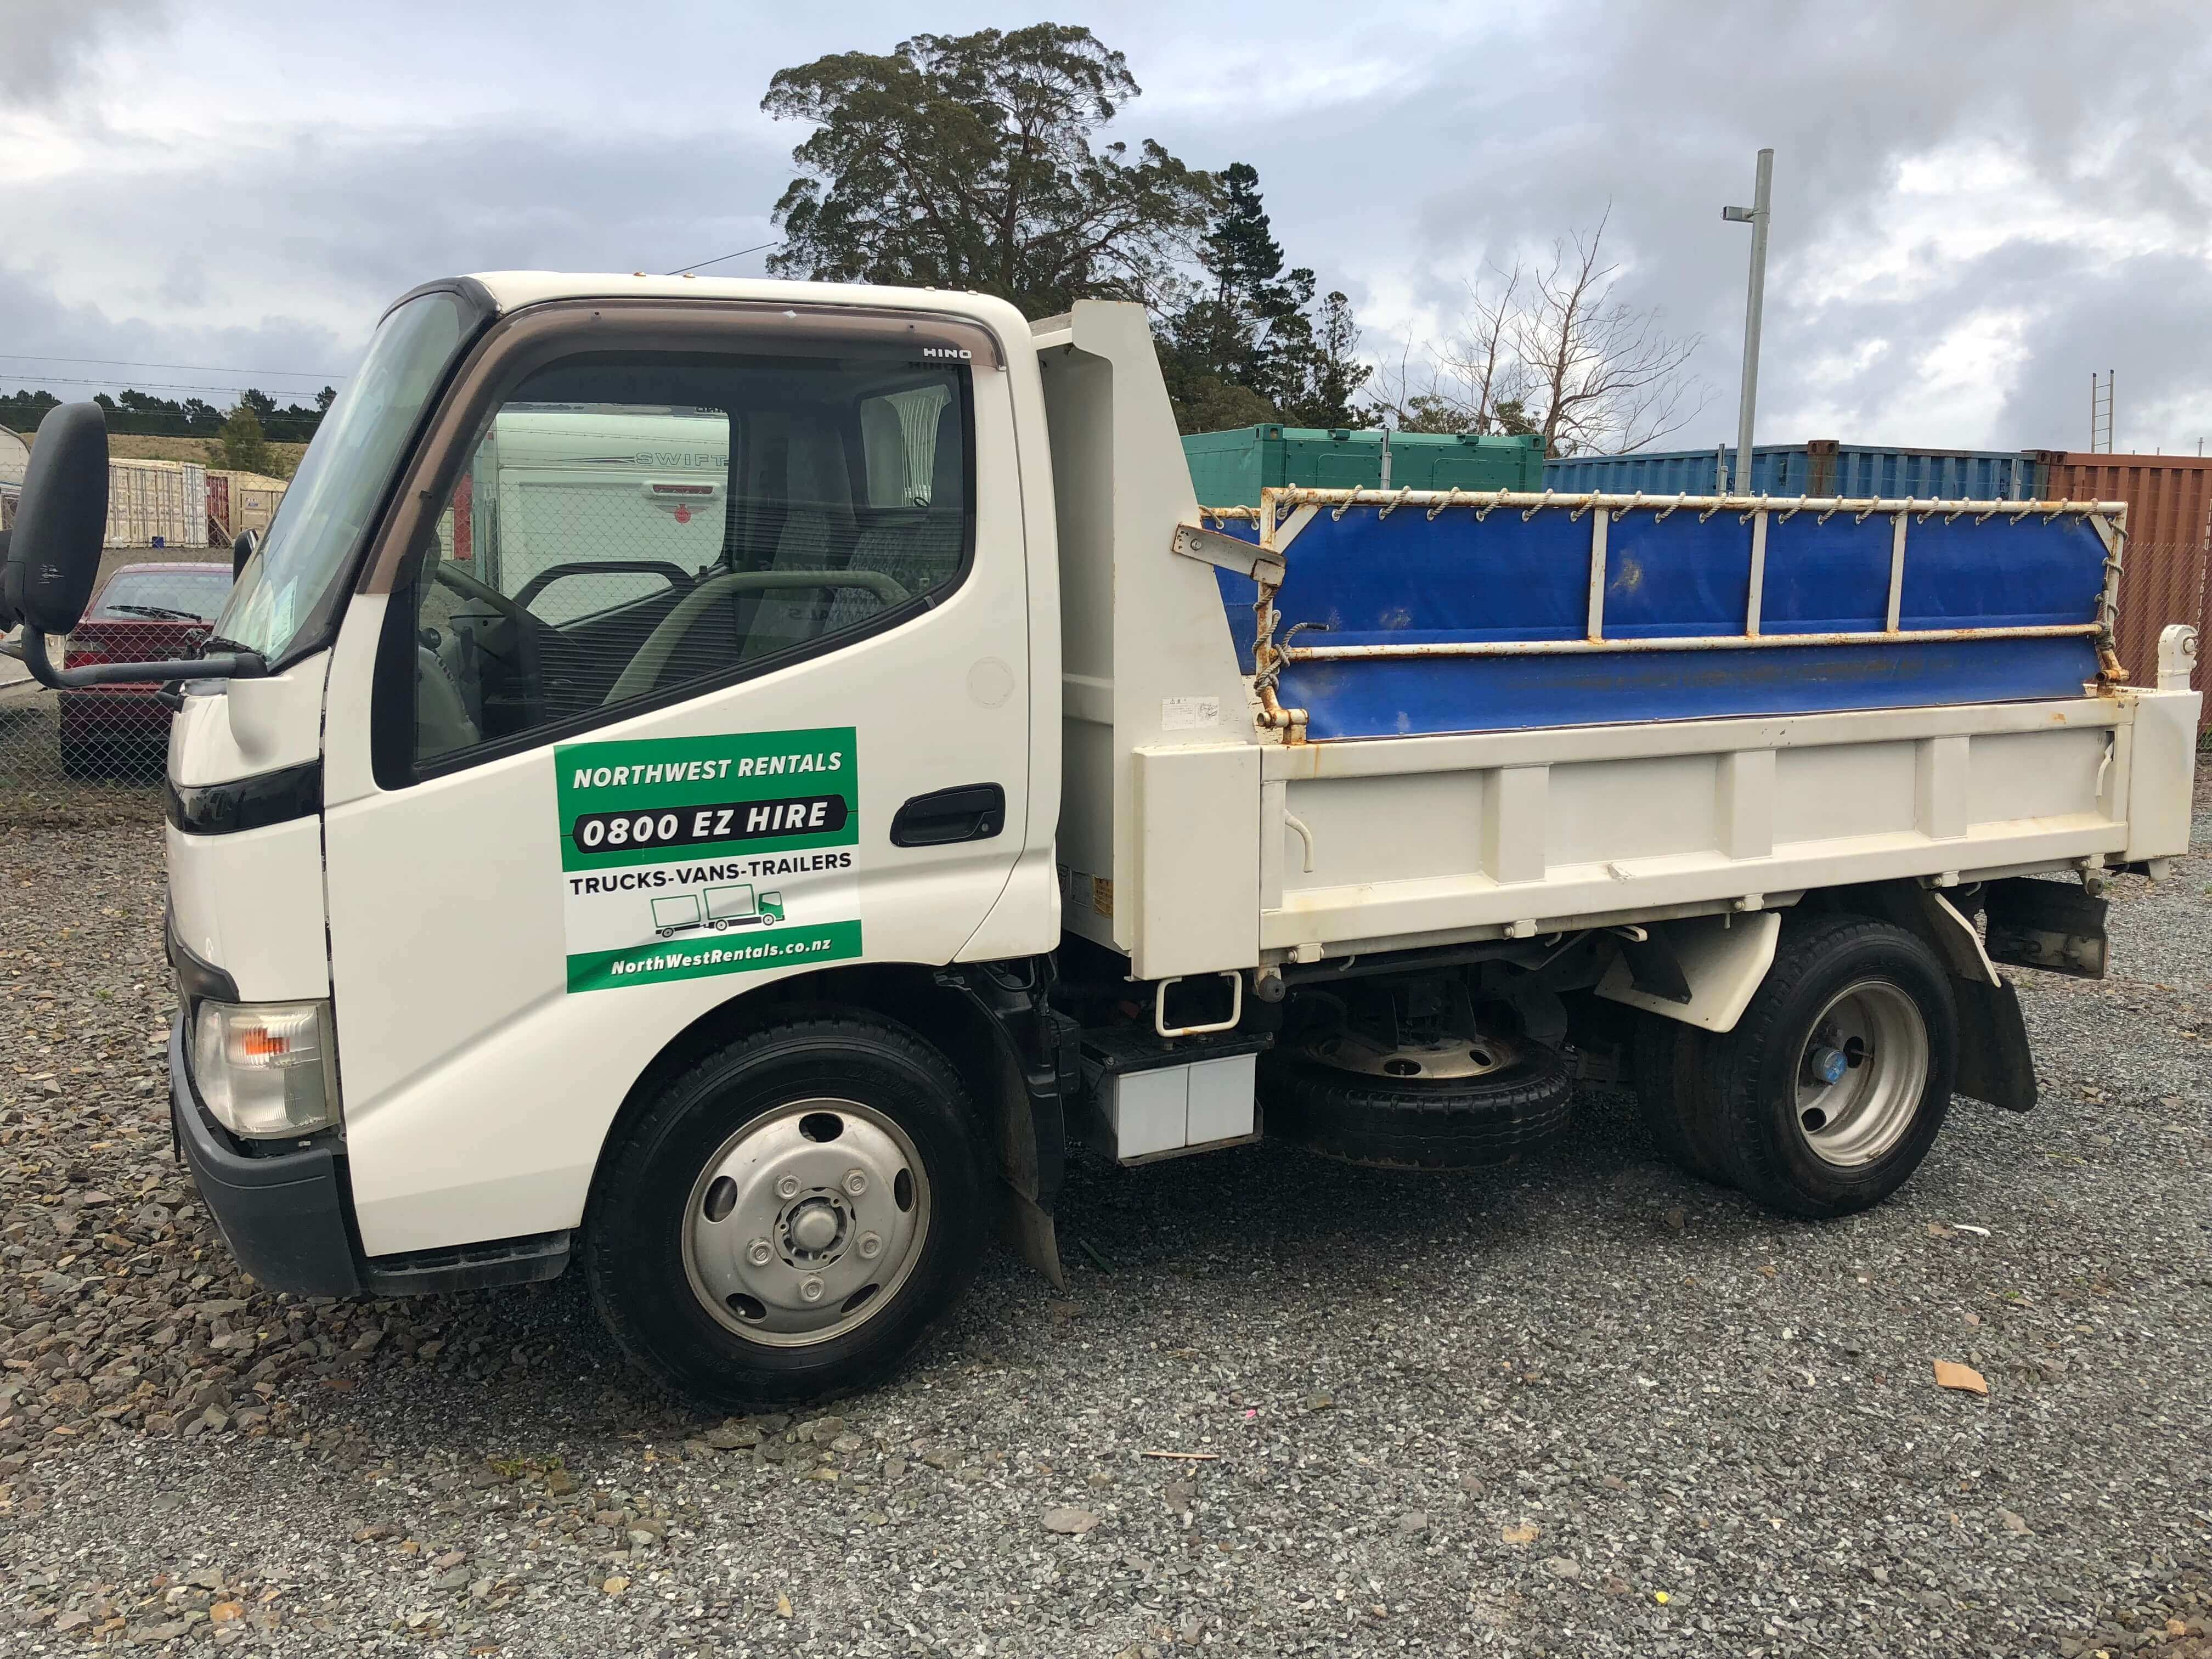 Meet Helga - the Small Truck that loves Big Loads